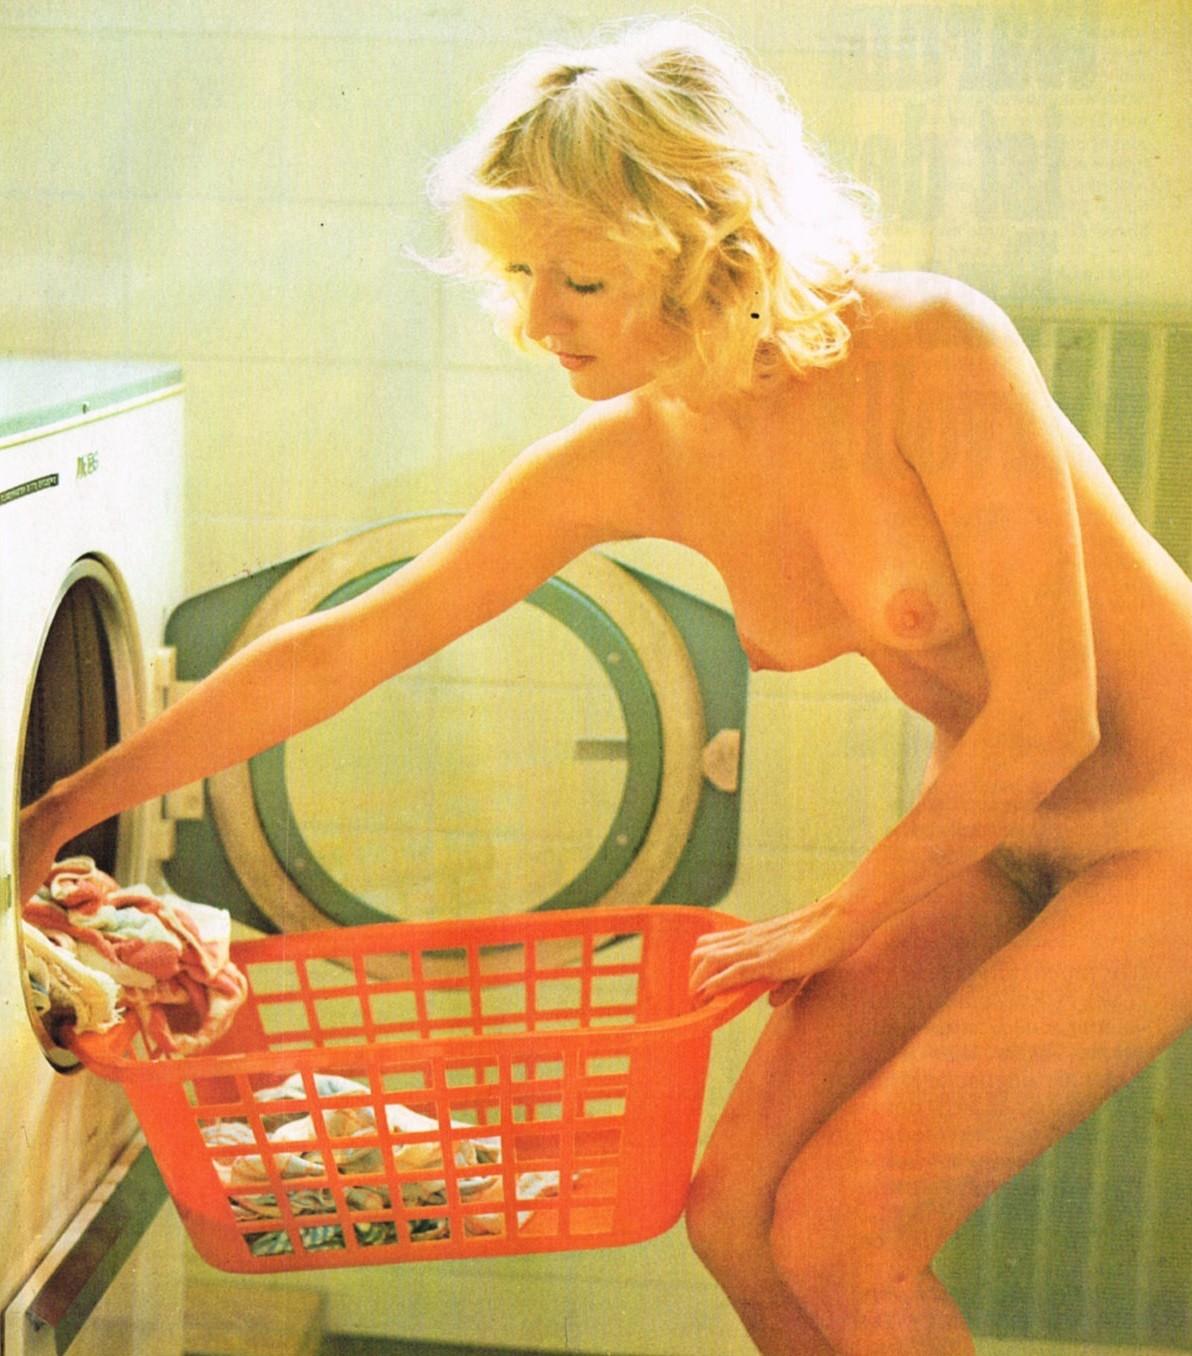 laundry-girls-nude-washing-machine-photo-mix-50